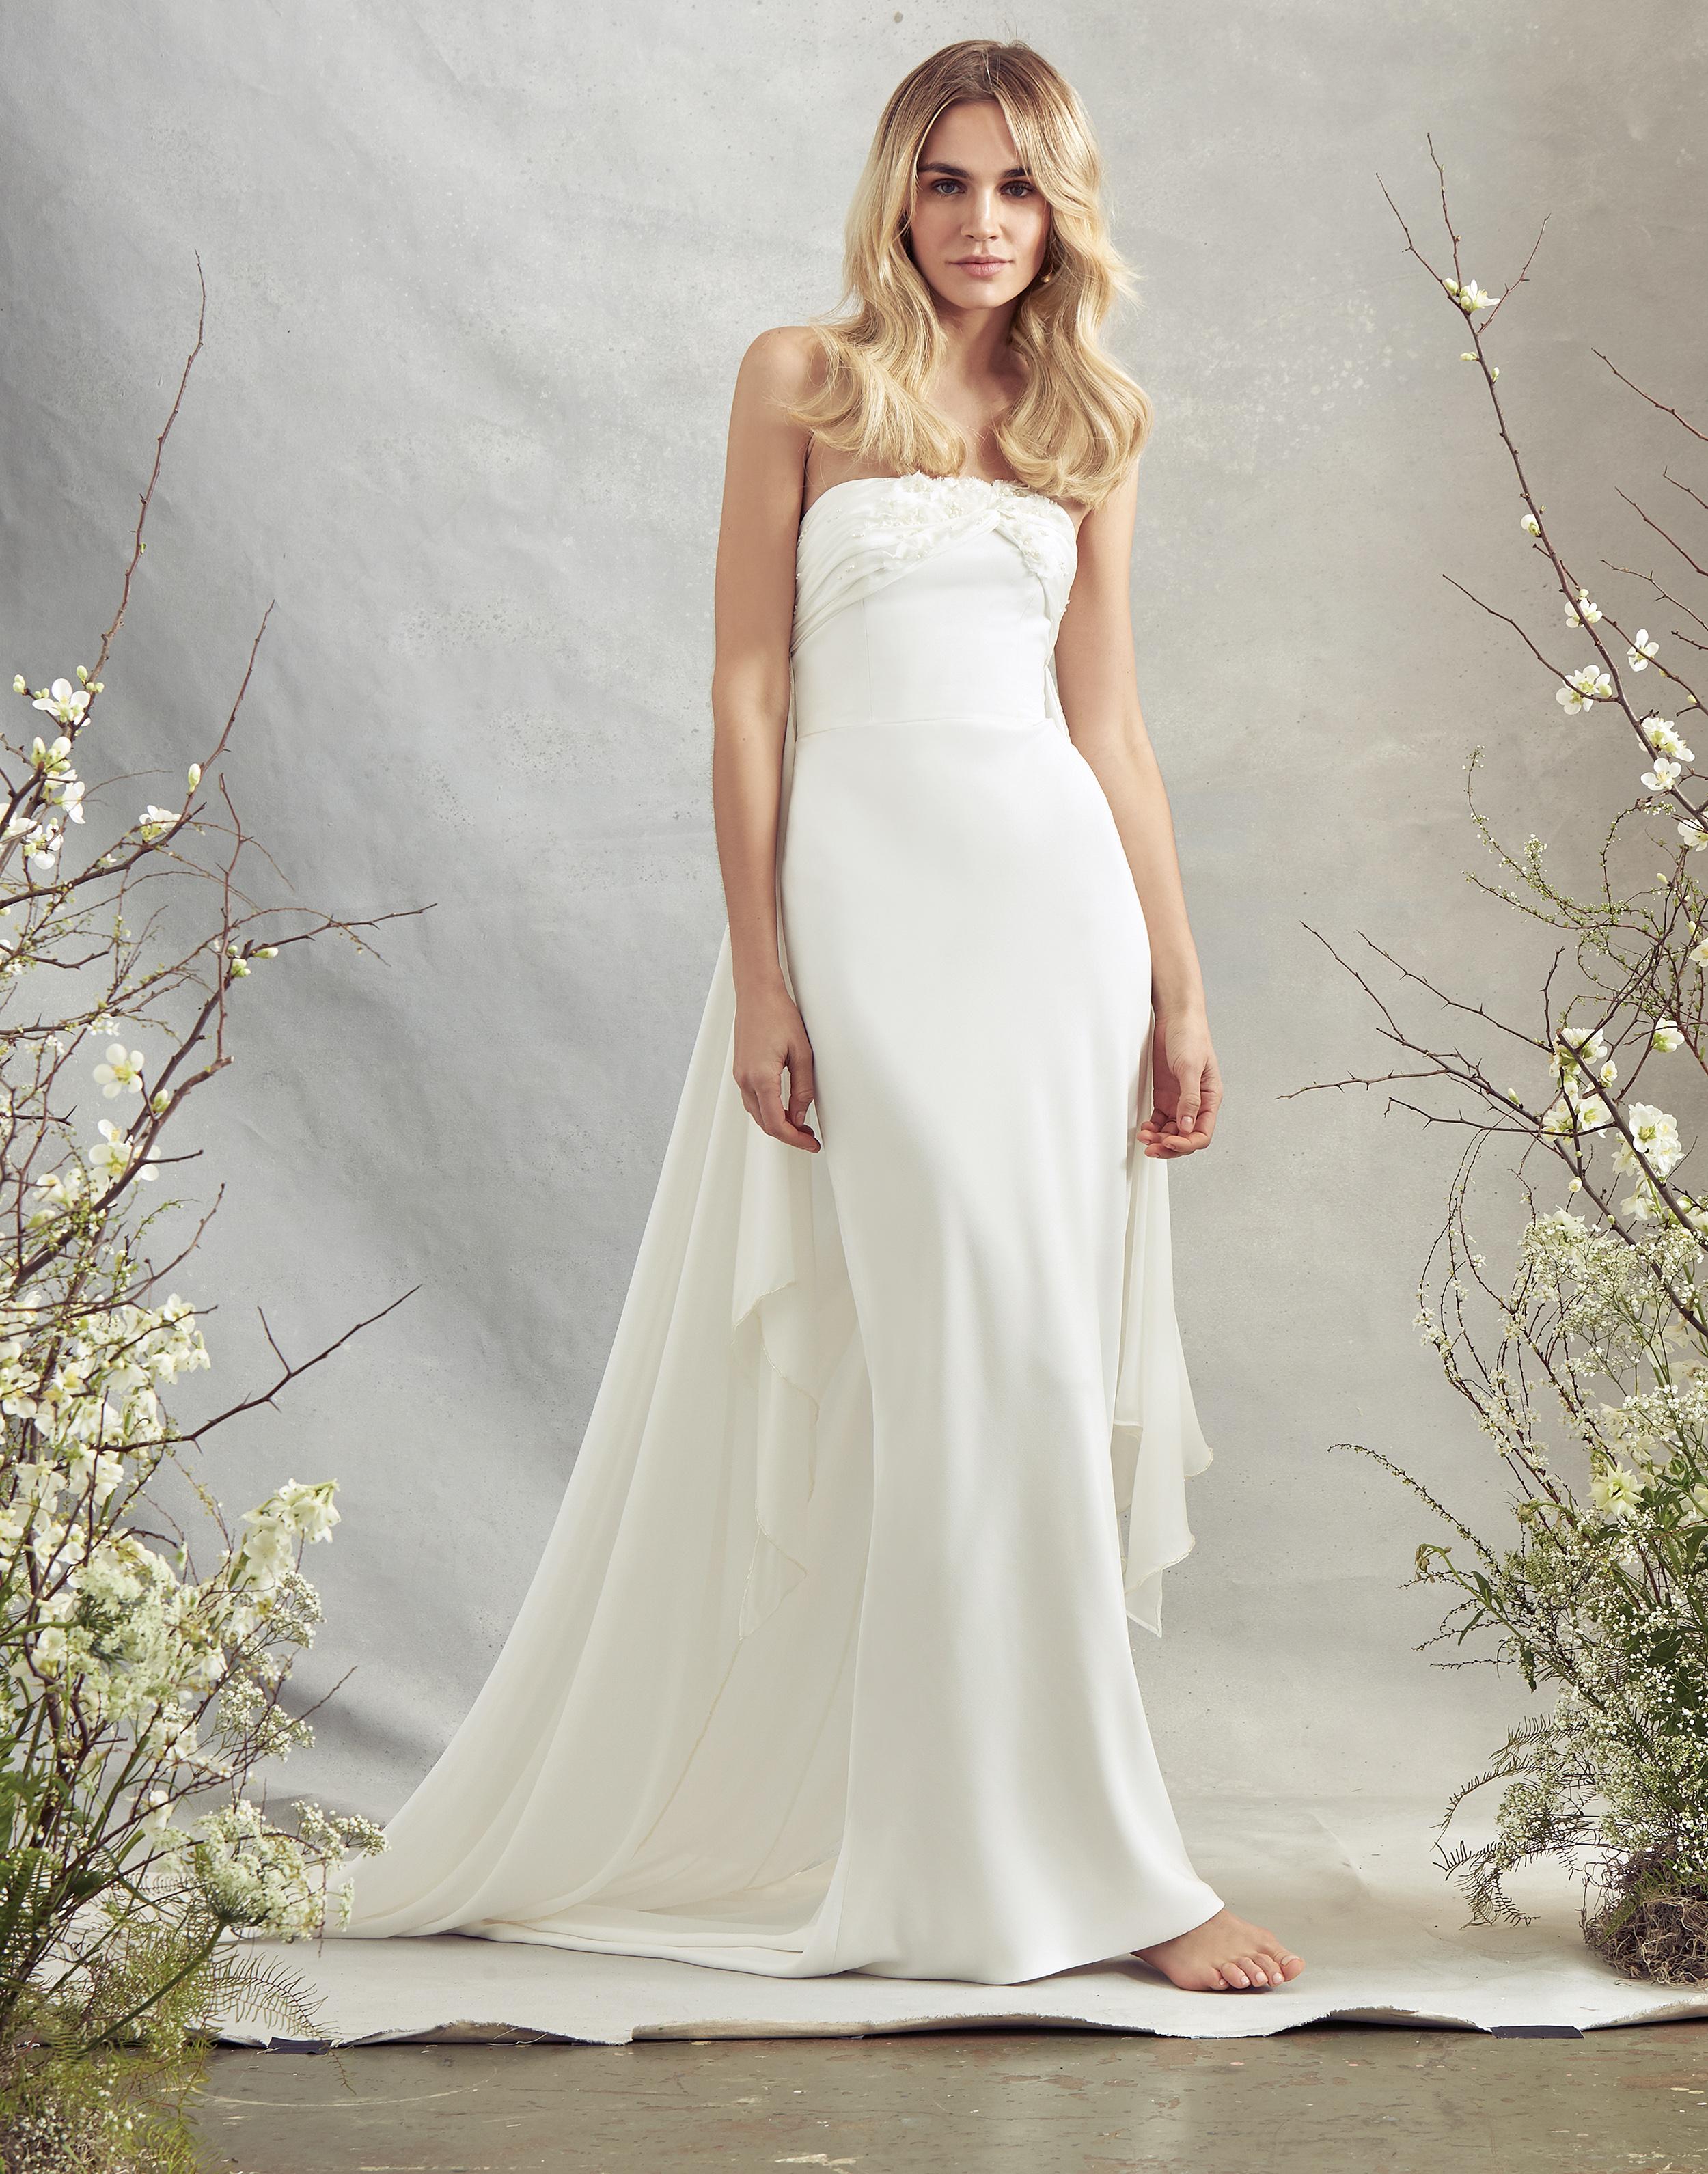 savannah miller strapless mermaid wedding dress spring 2020